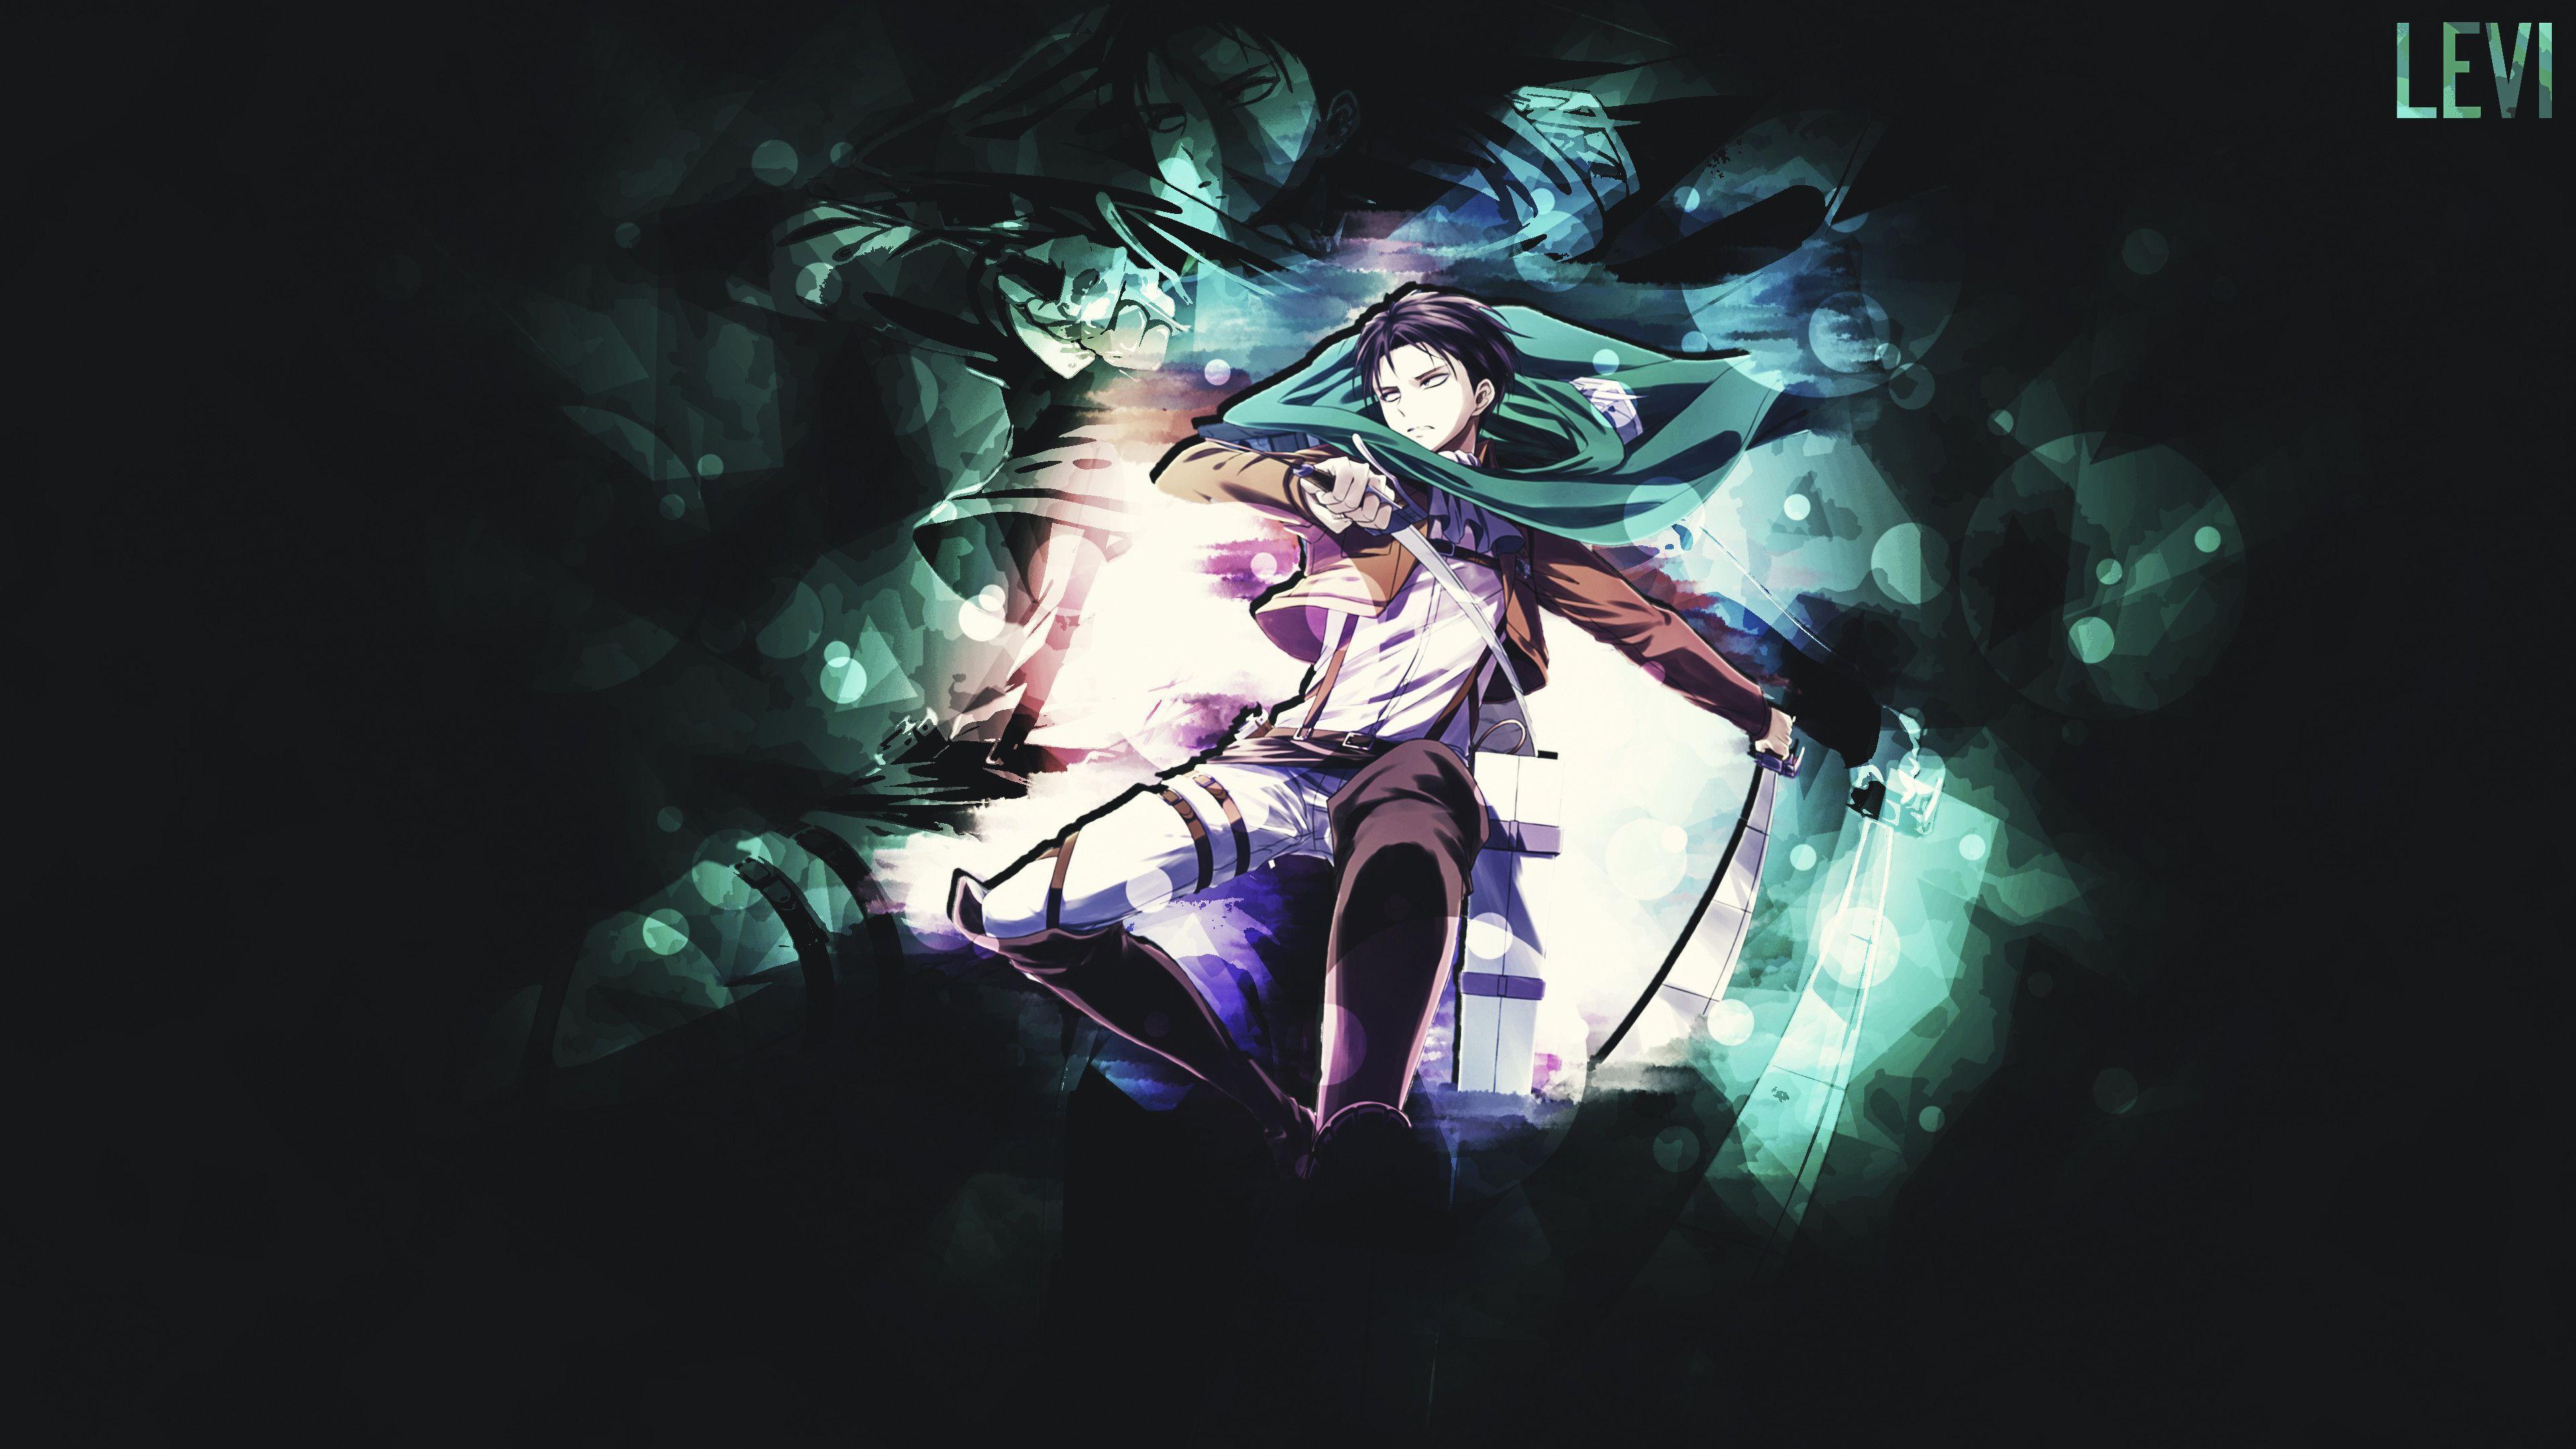 Unduh 66 Wallpaper Anime Levi Hd HD Gratid